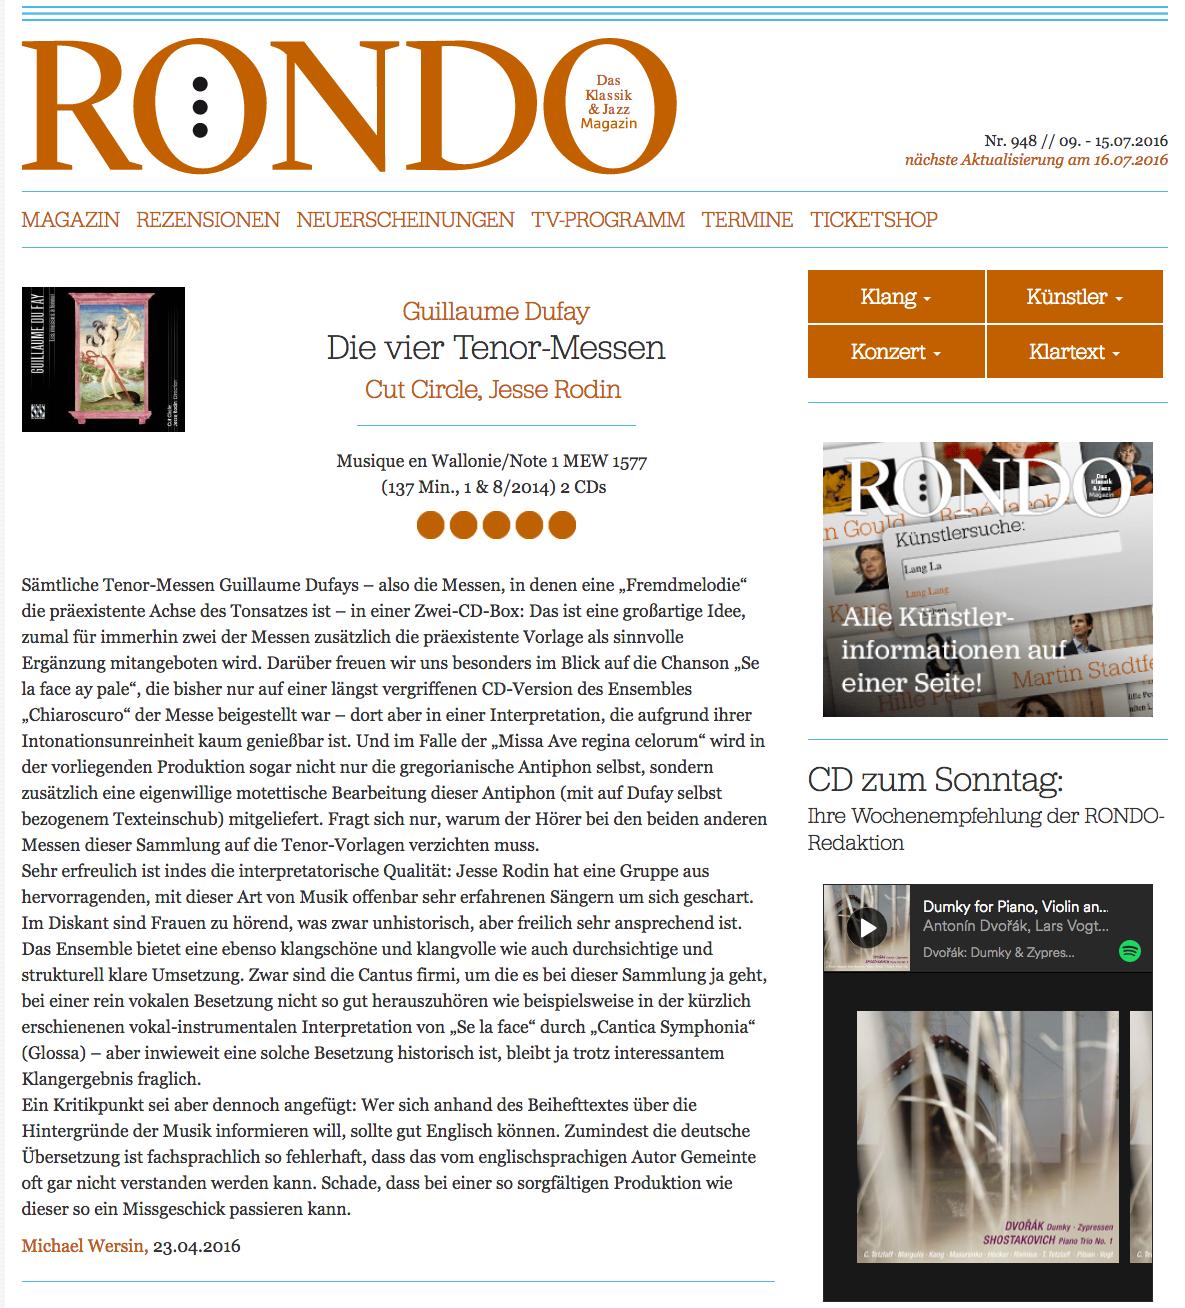 Rondo Review